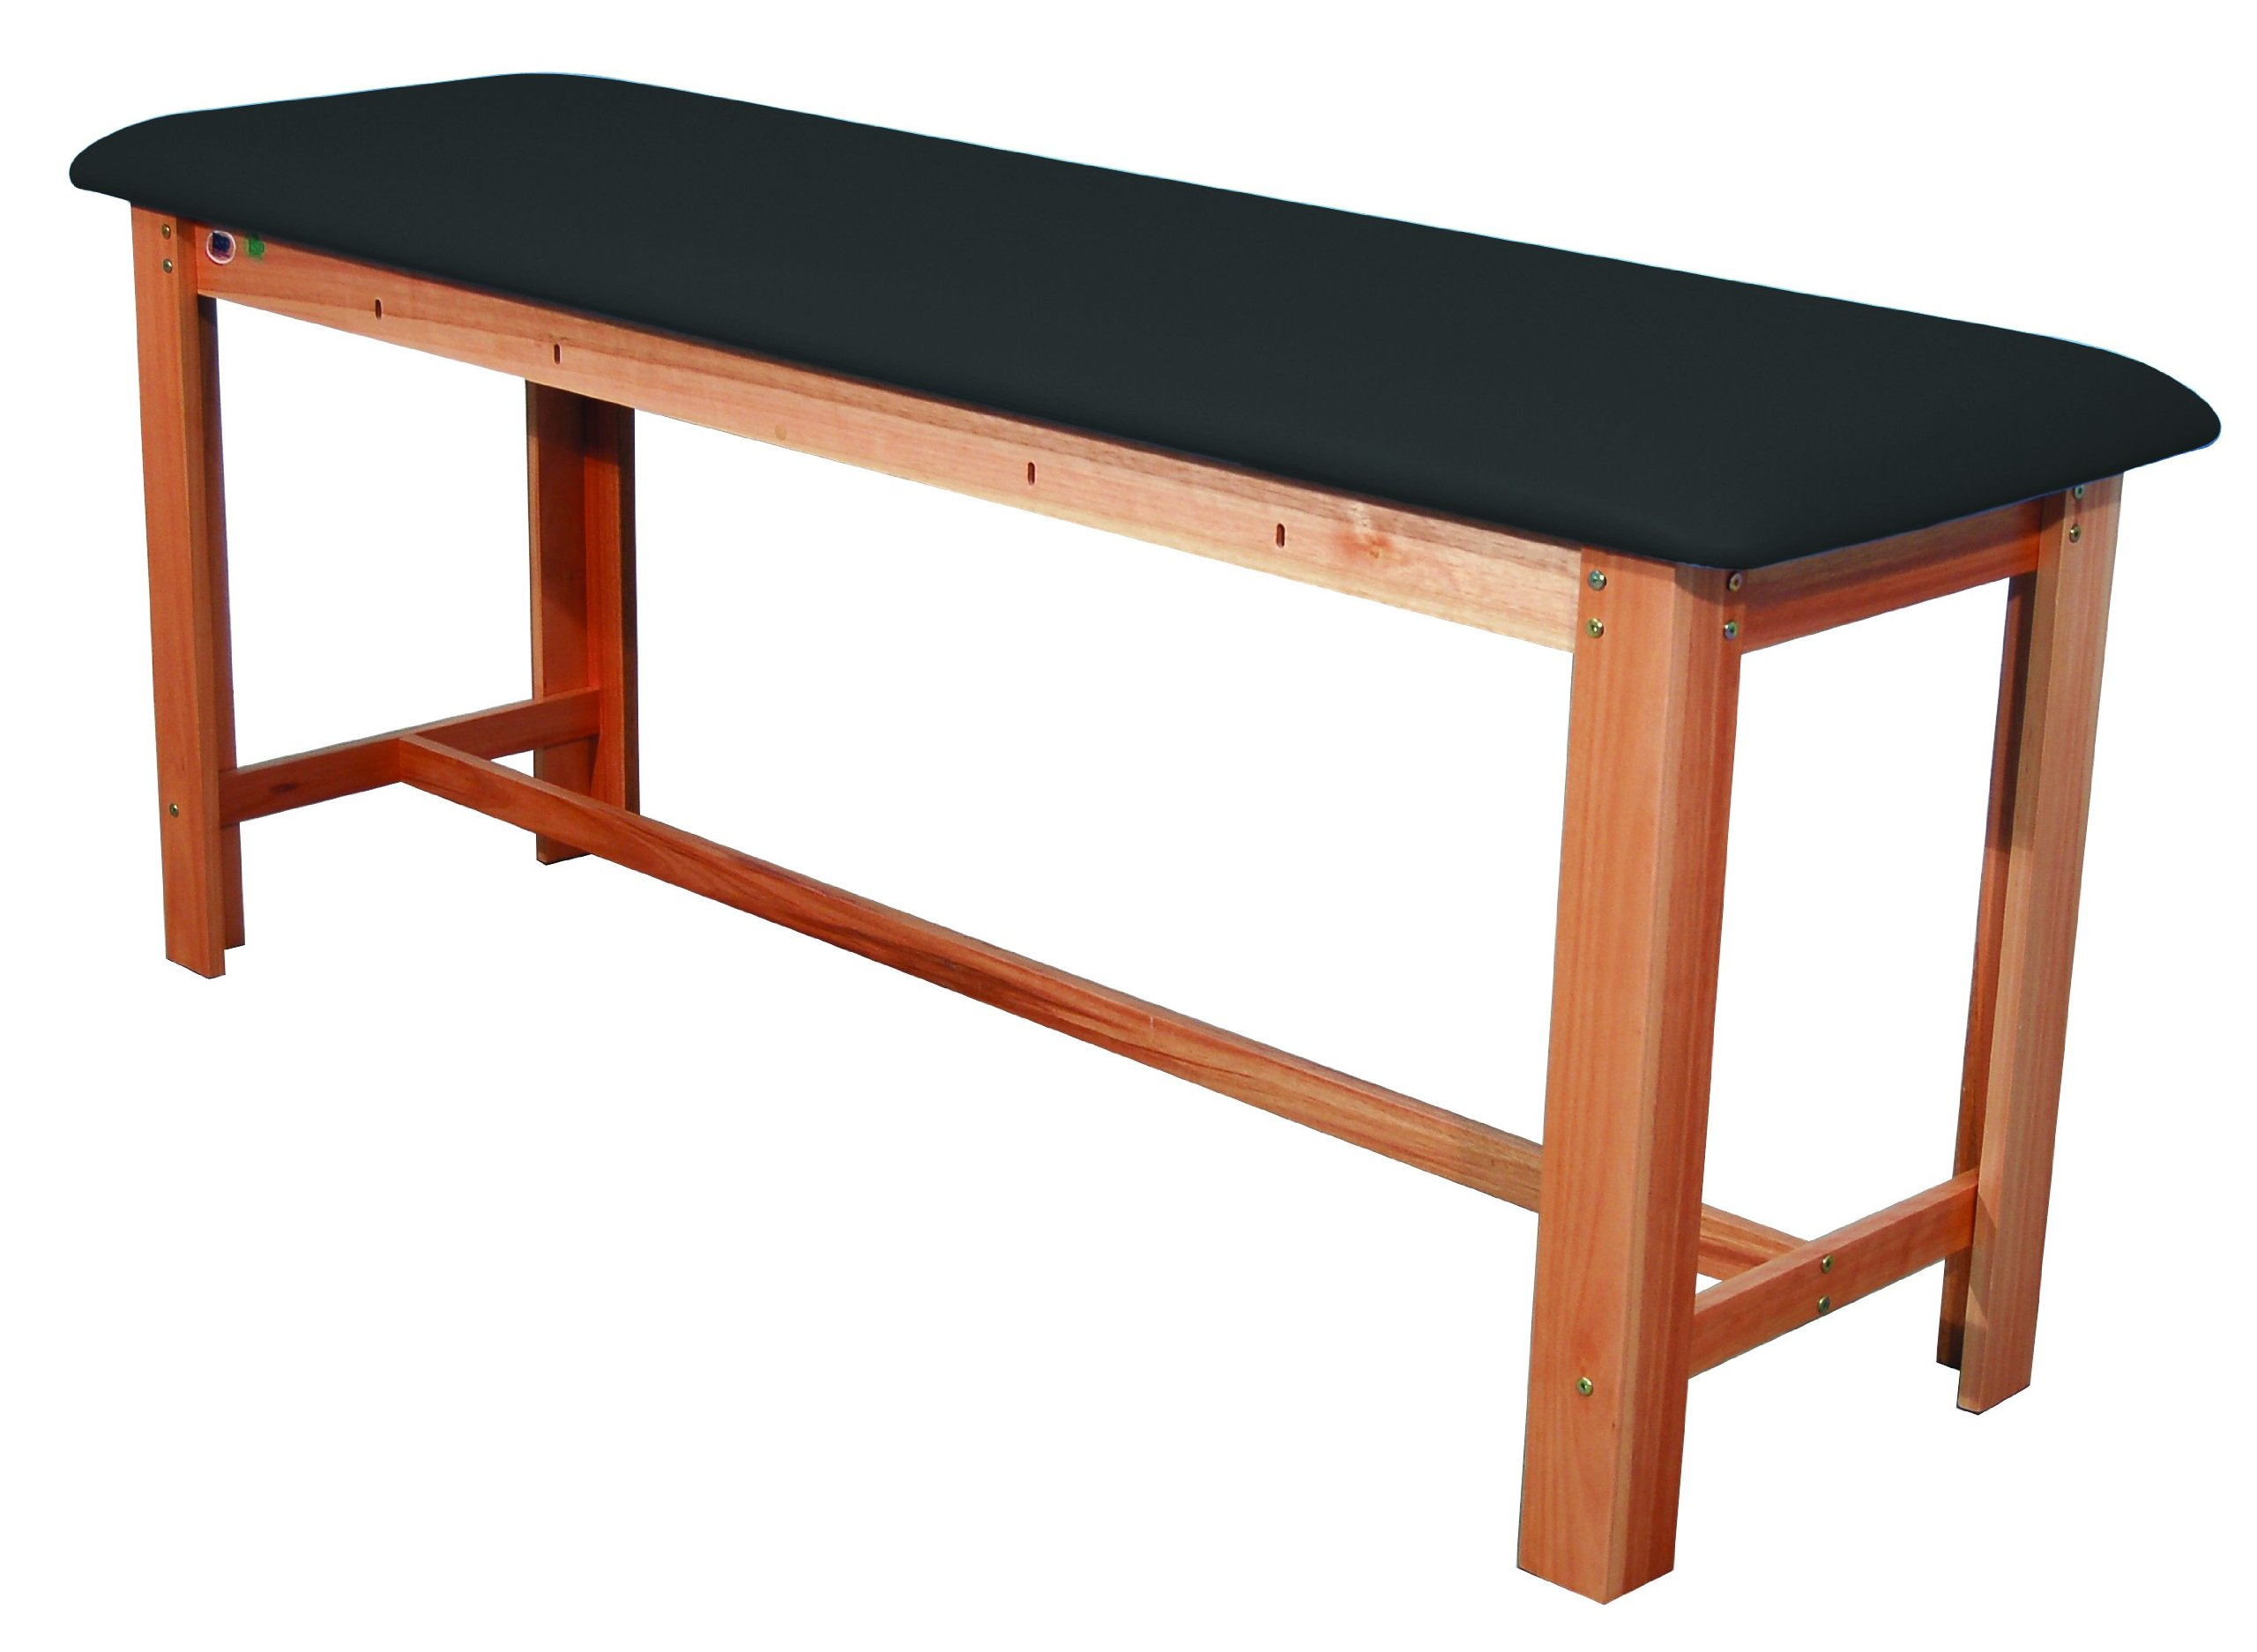 3B Scientific W15074B Black Hardwood Classic Exam Treatment Table with H-Brace, 74.8'' Length x 24.4'' Width x 33.1'' Height